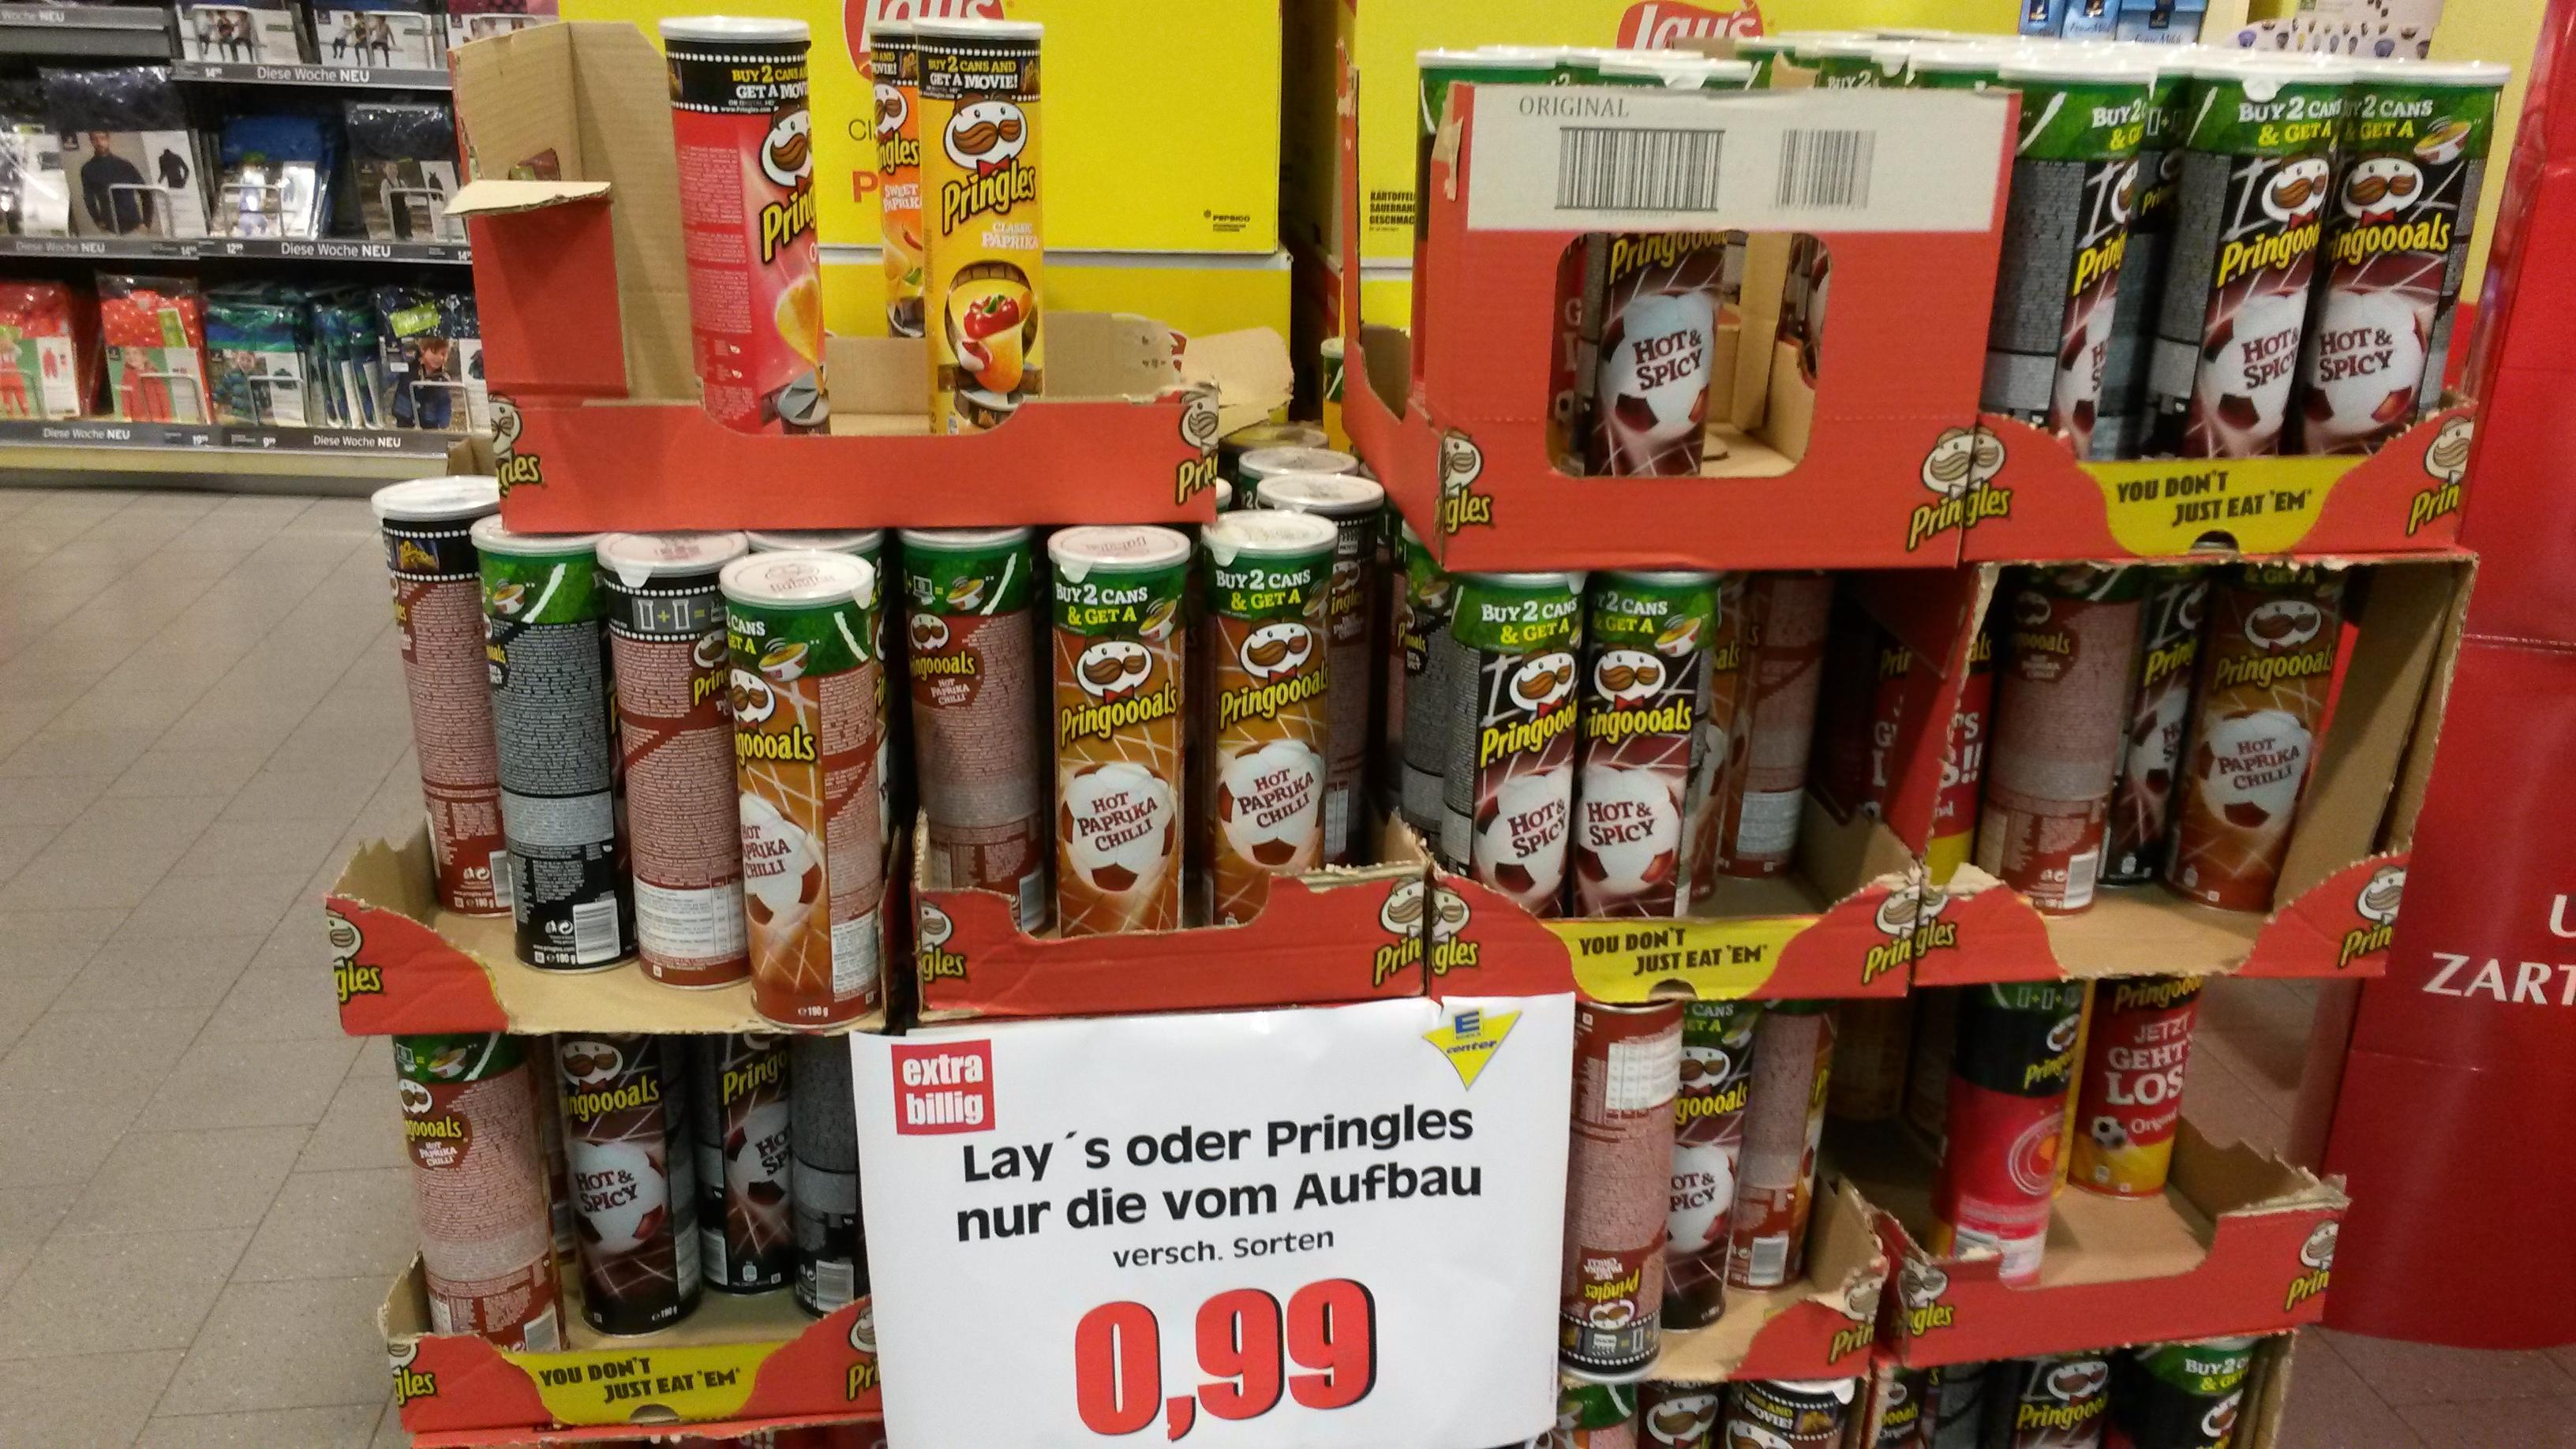 [Lokal] E-Center Tempelhof Pringles für 99 Cent